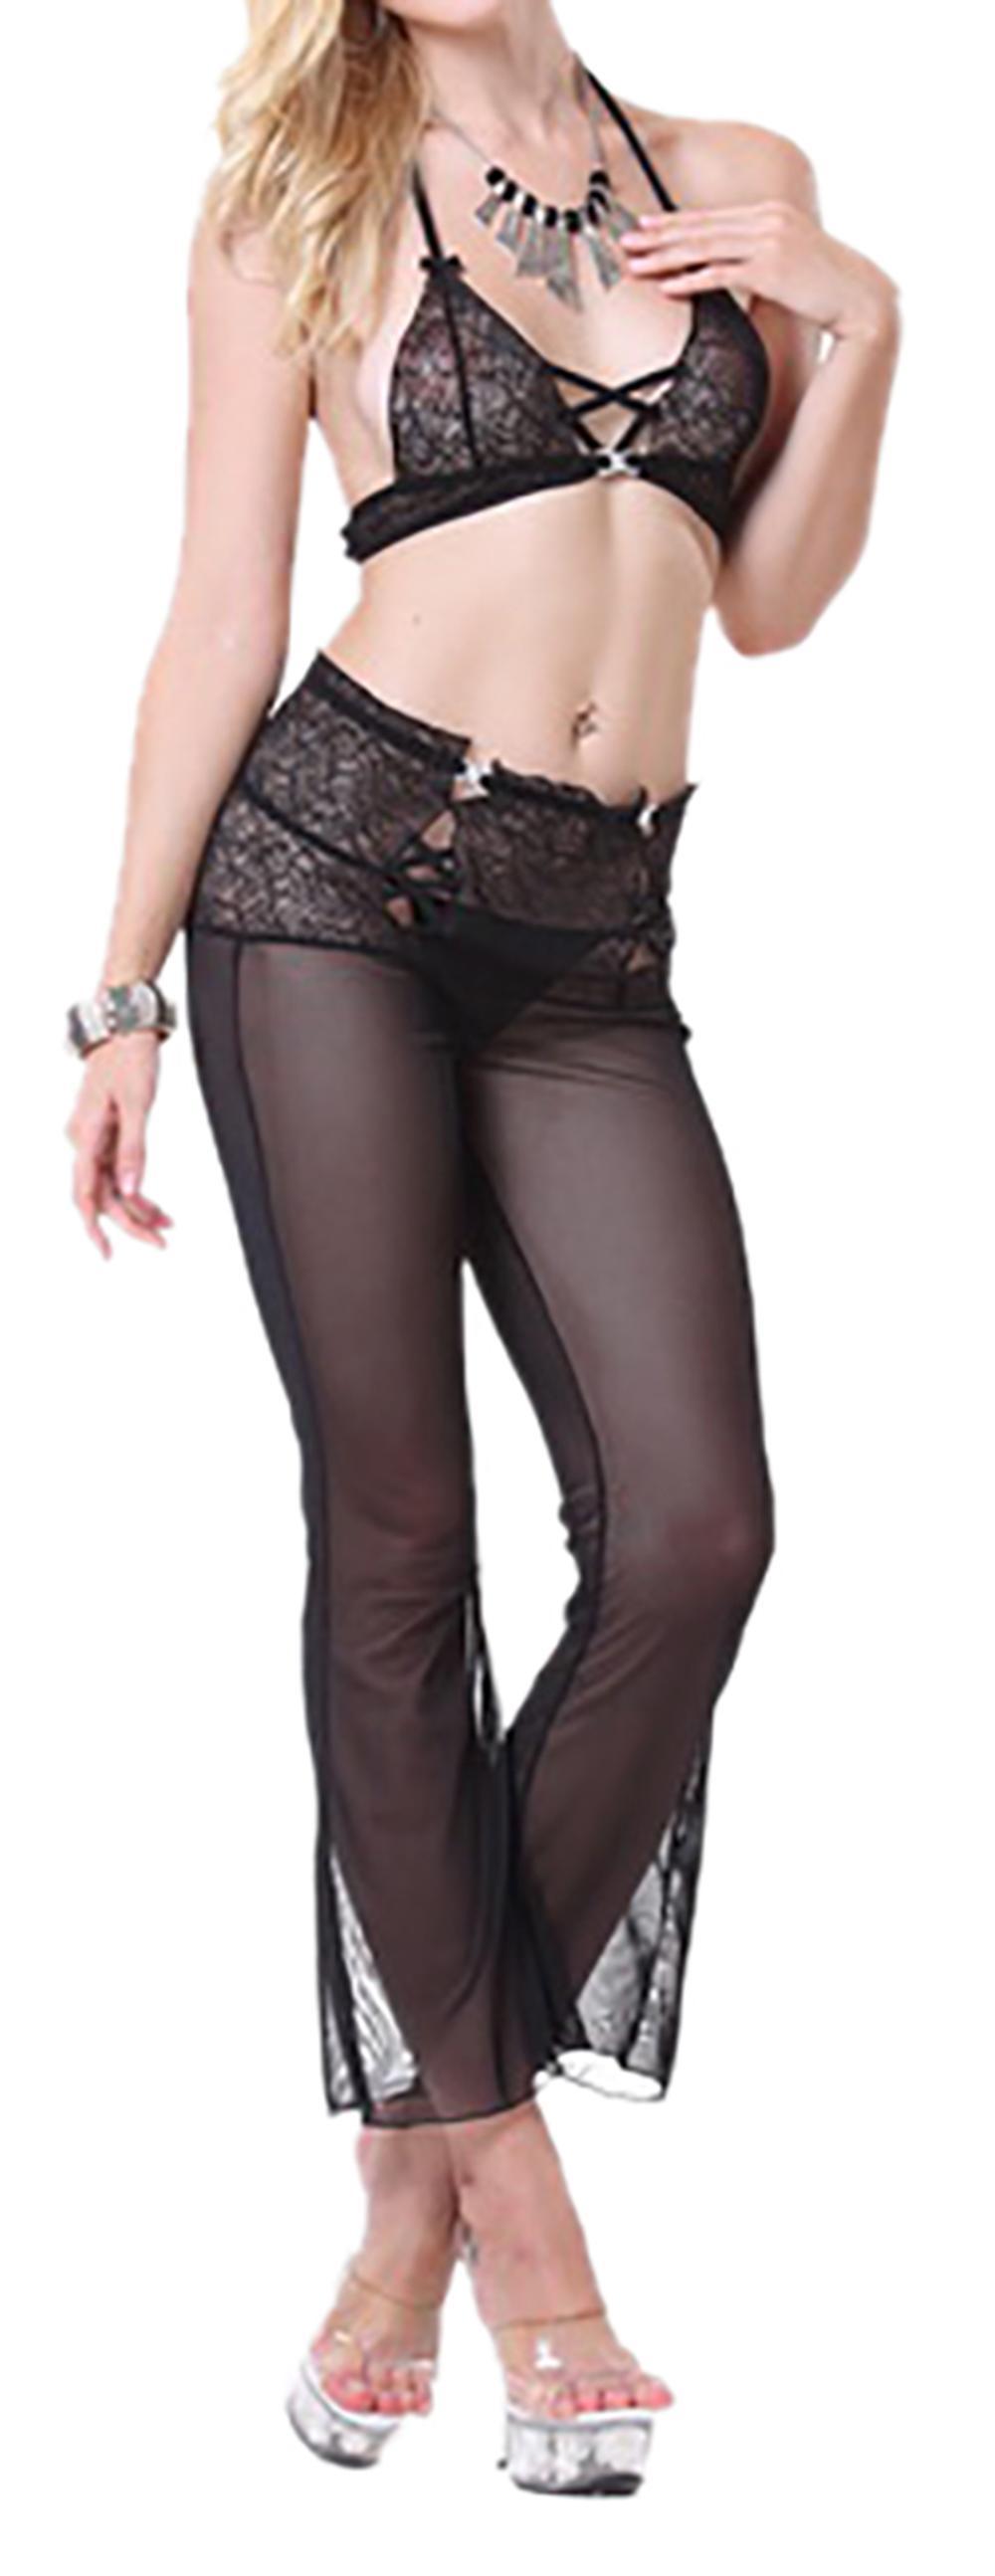 Waooh - Set lingerie bra and pants transparent Saeg